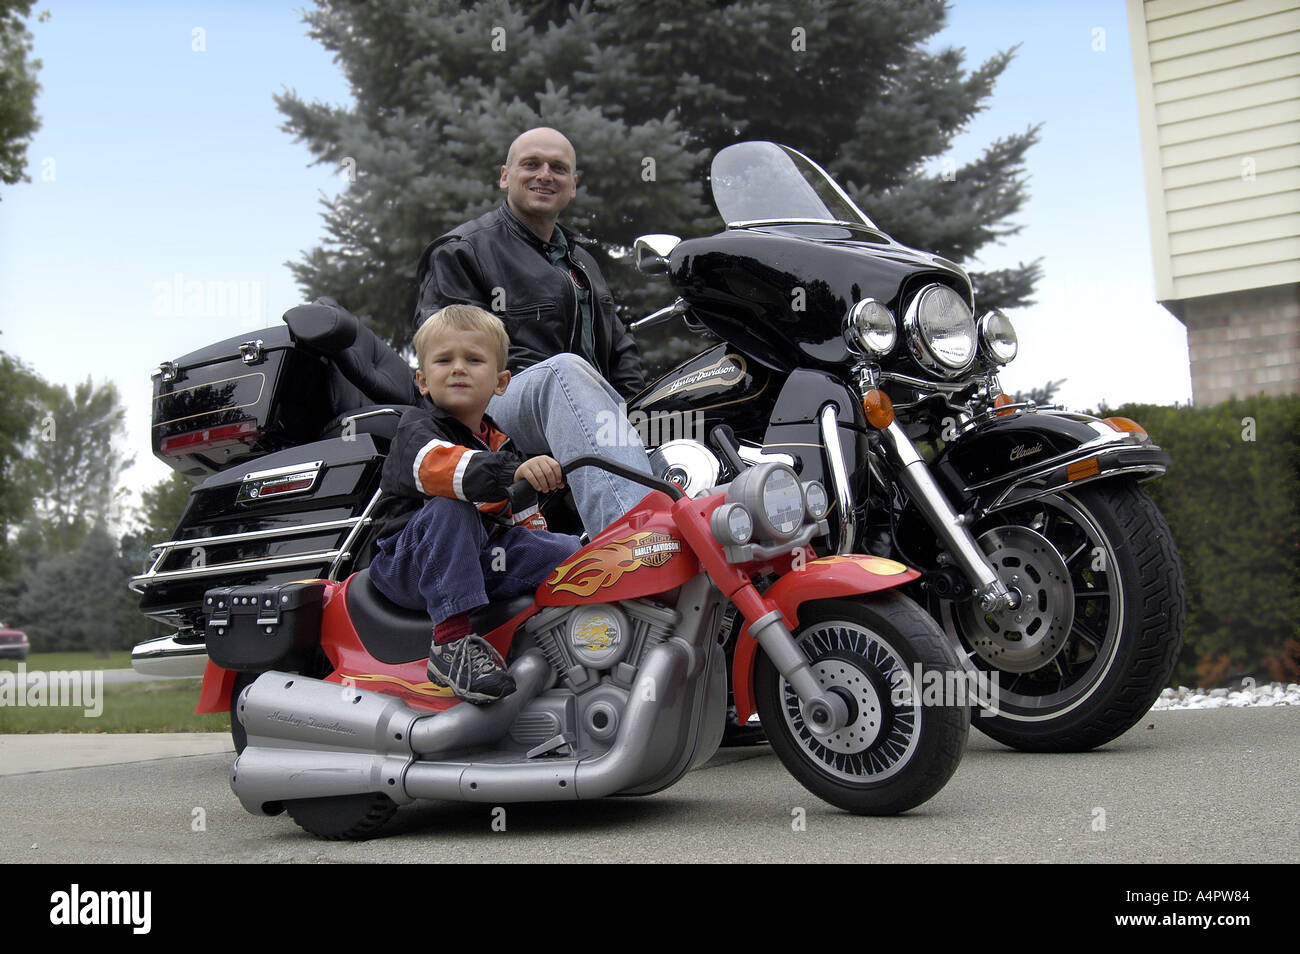 Harley Davidson Philippines Price